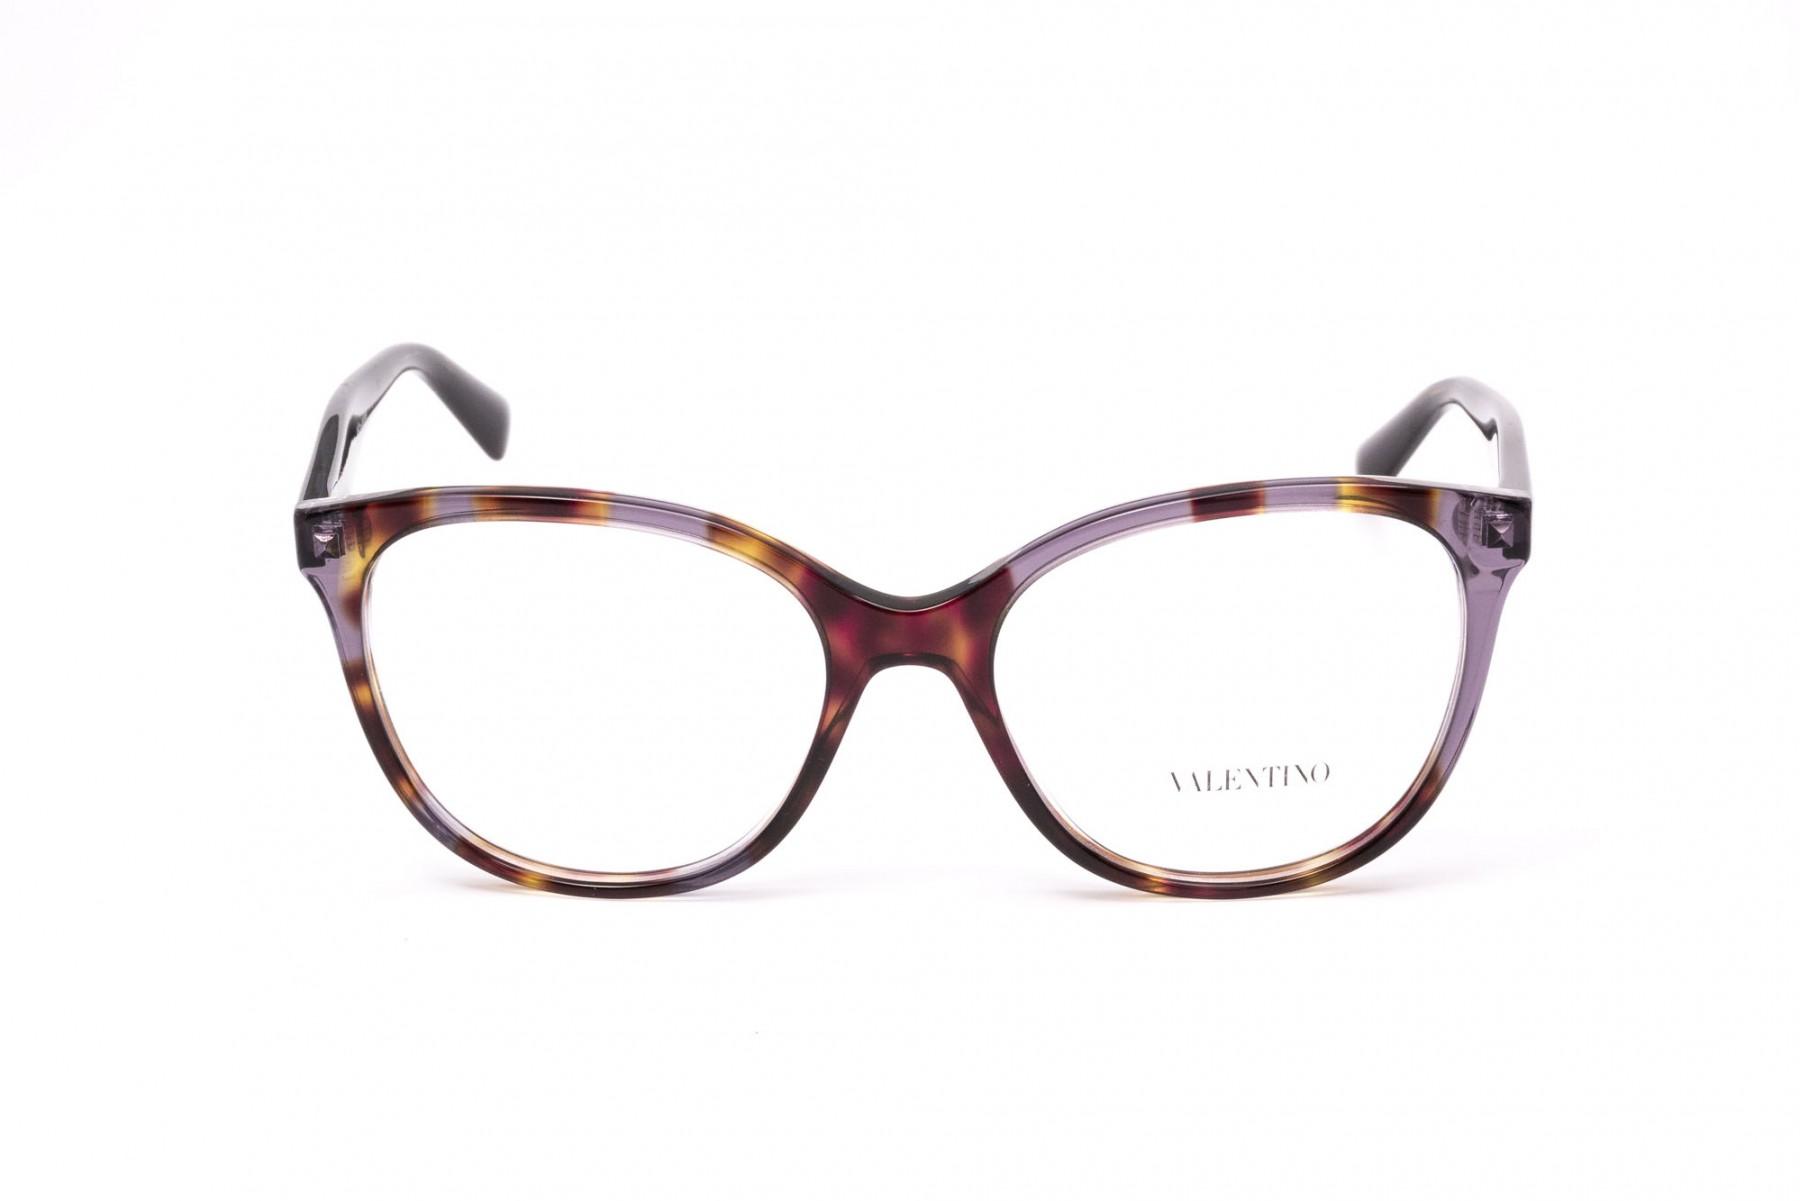 VALENTINO 3014 5059 53